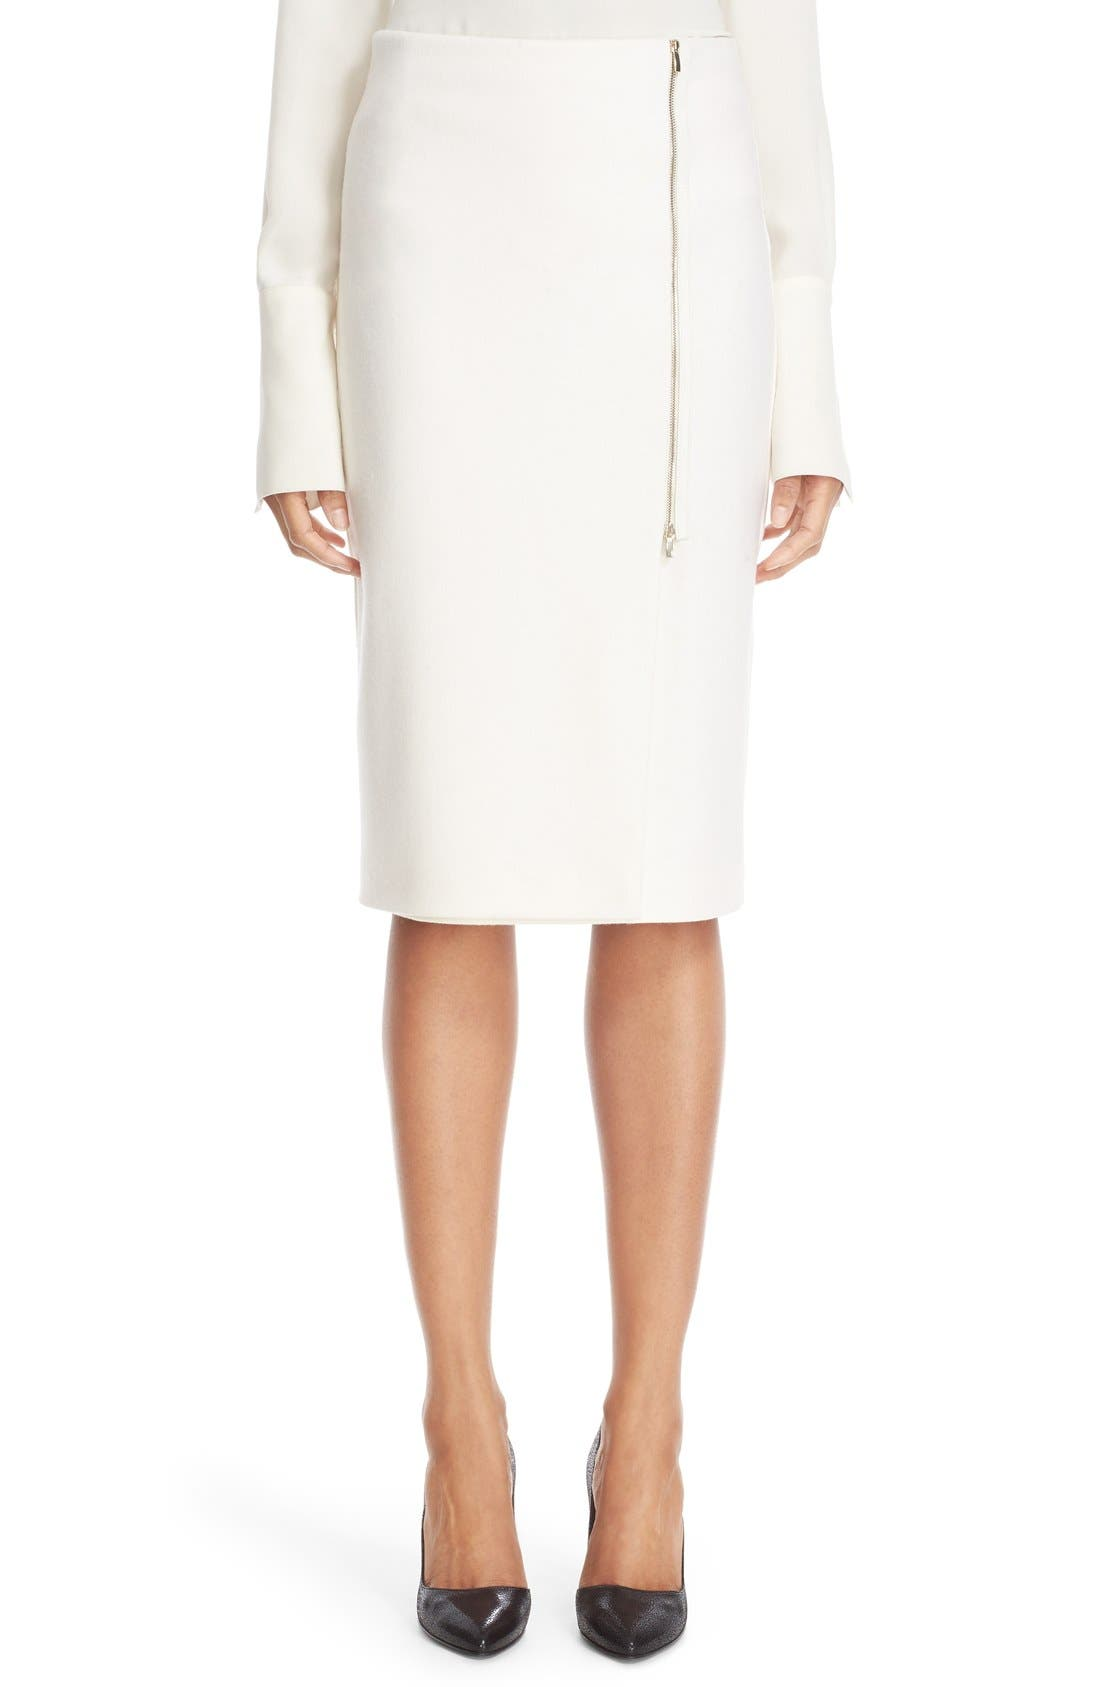 Alternate Image 1 Selected - Max Mara 'Visita' Wool Jersey Pencil Skirt